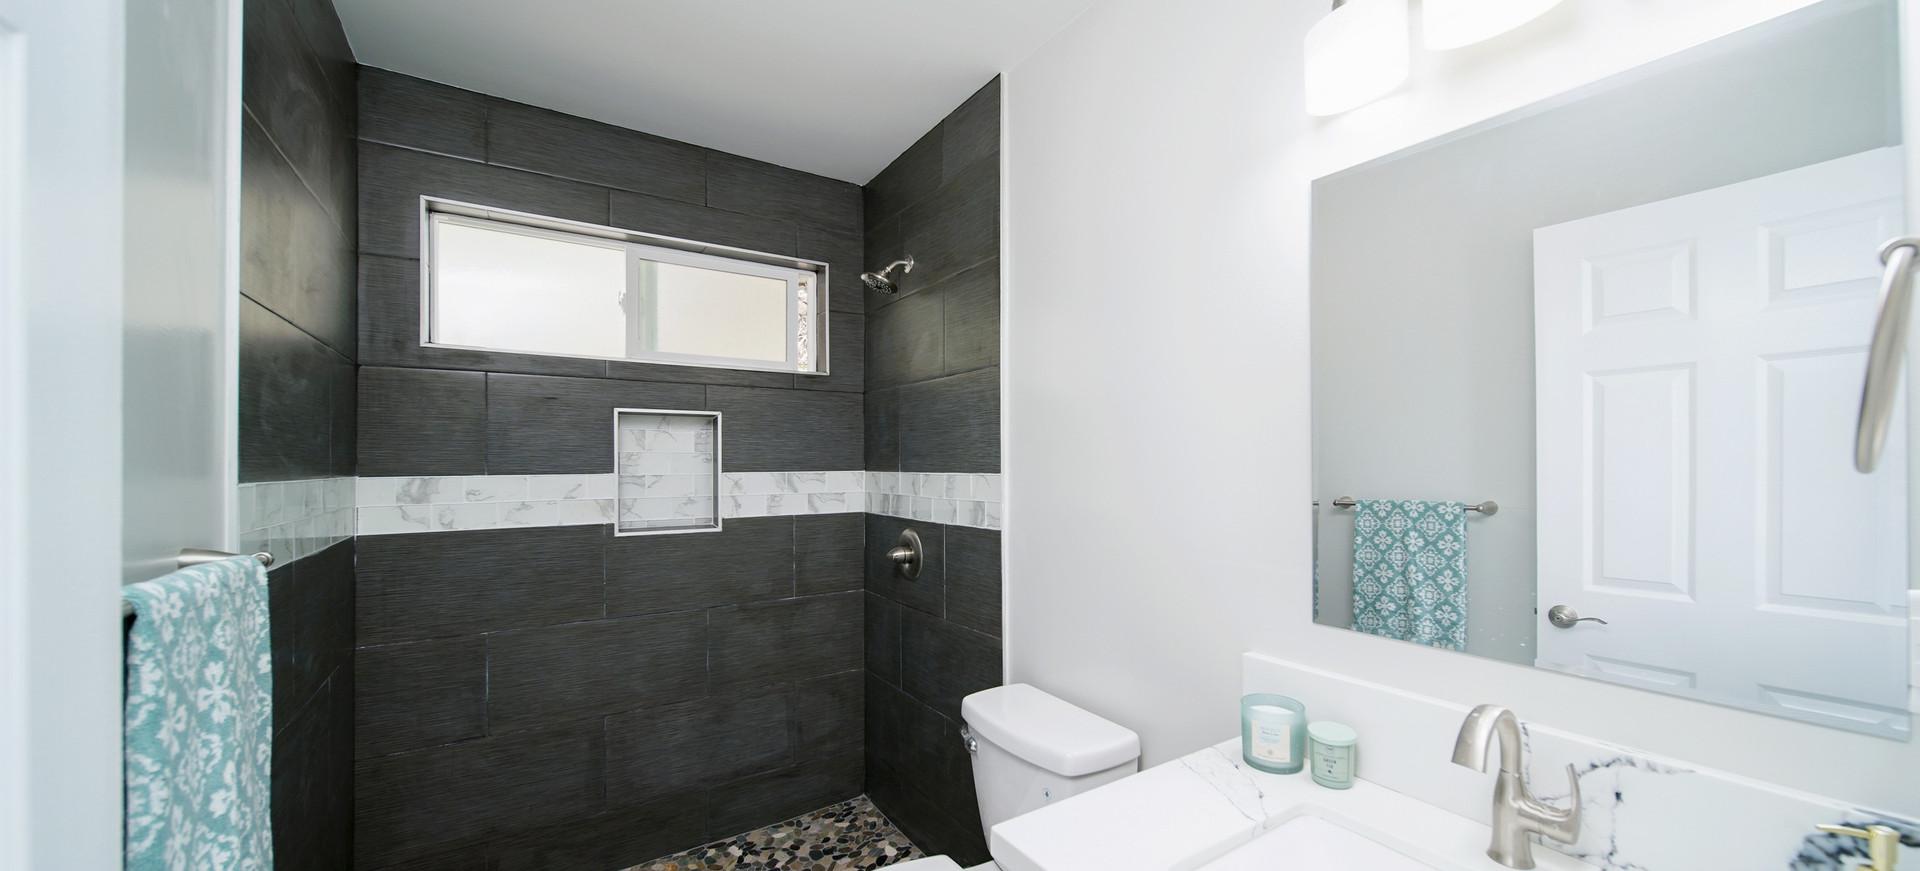 Bathroom of Hao Street Residence